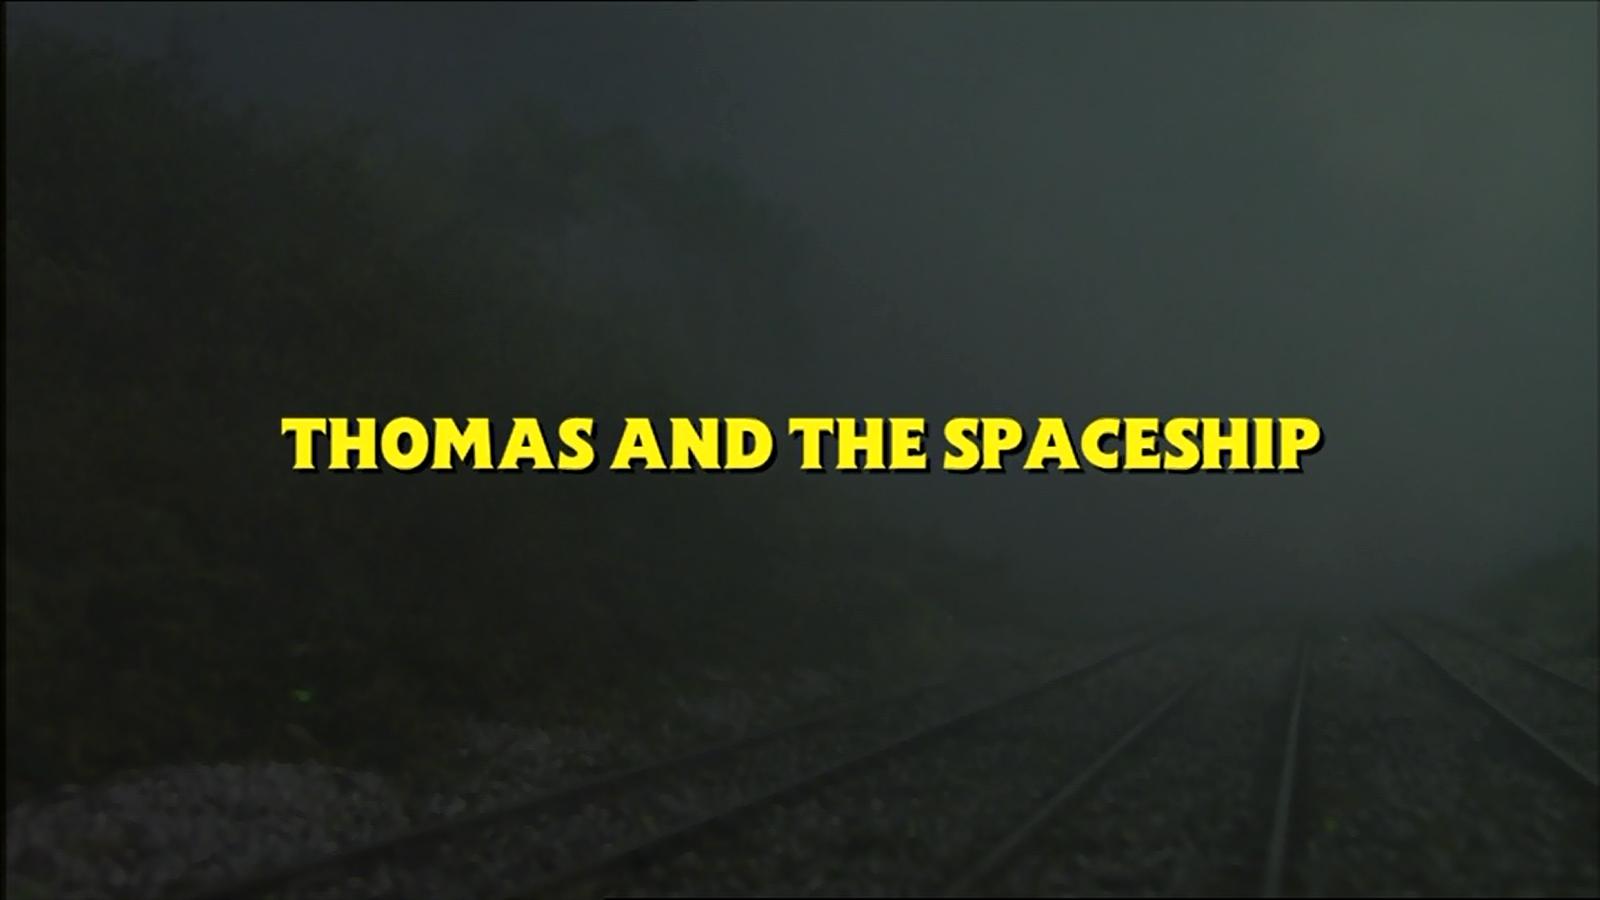 File:ThomasandtheSpaceshipTitleCard.png